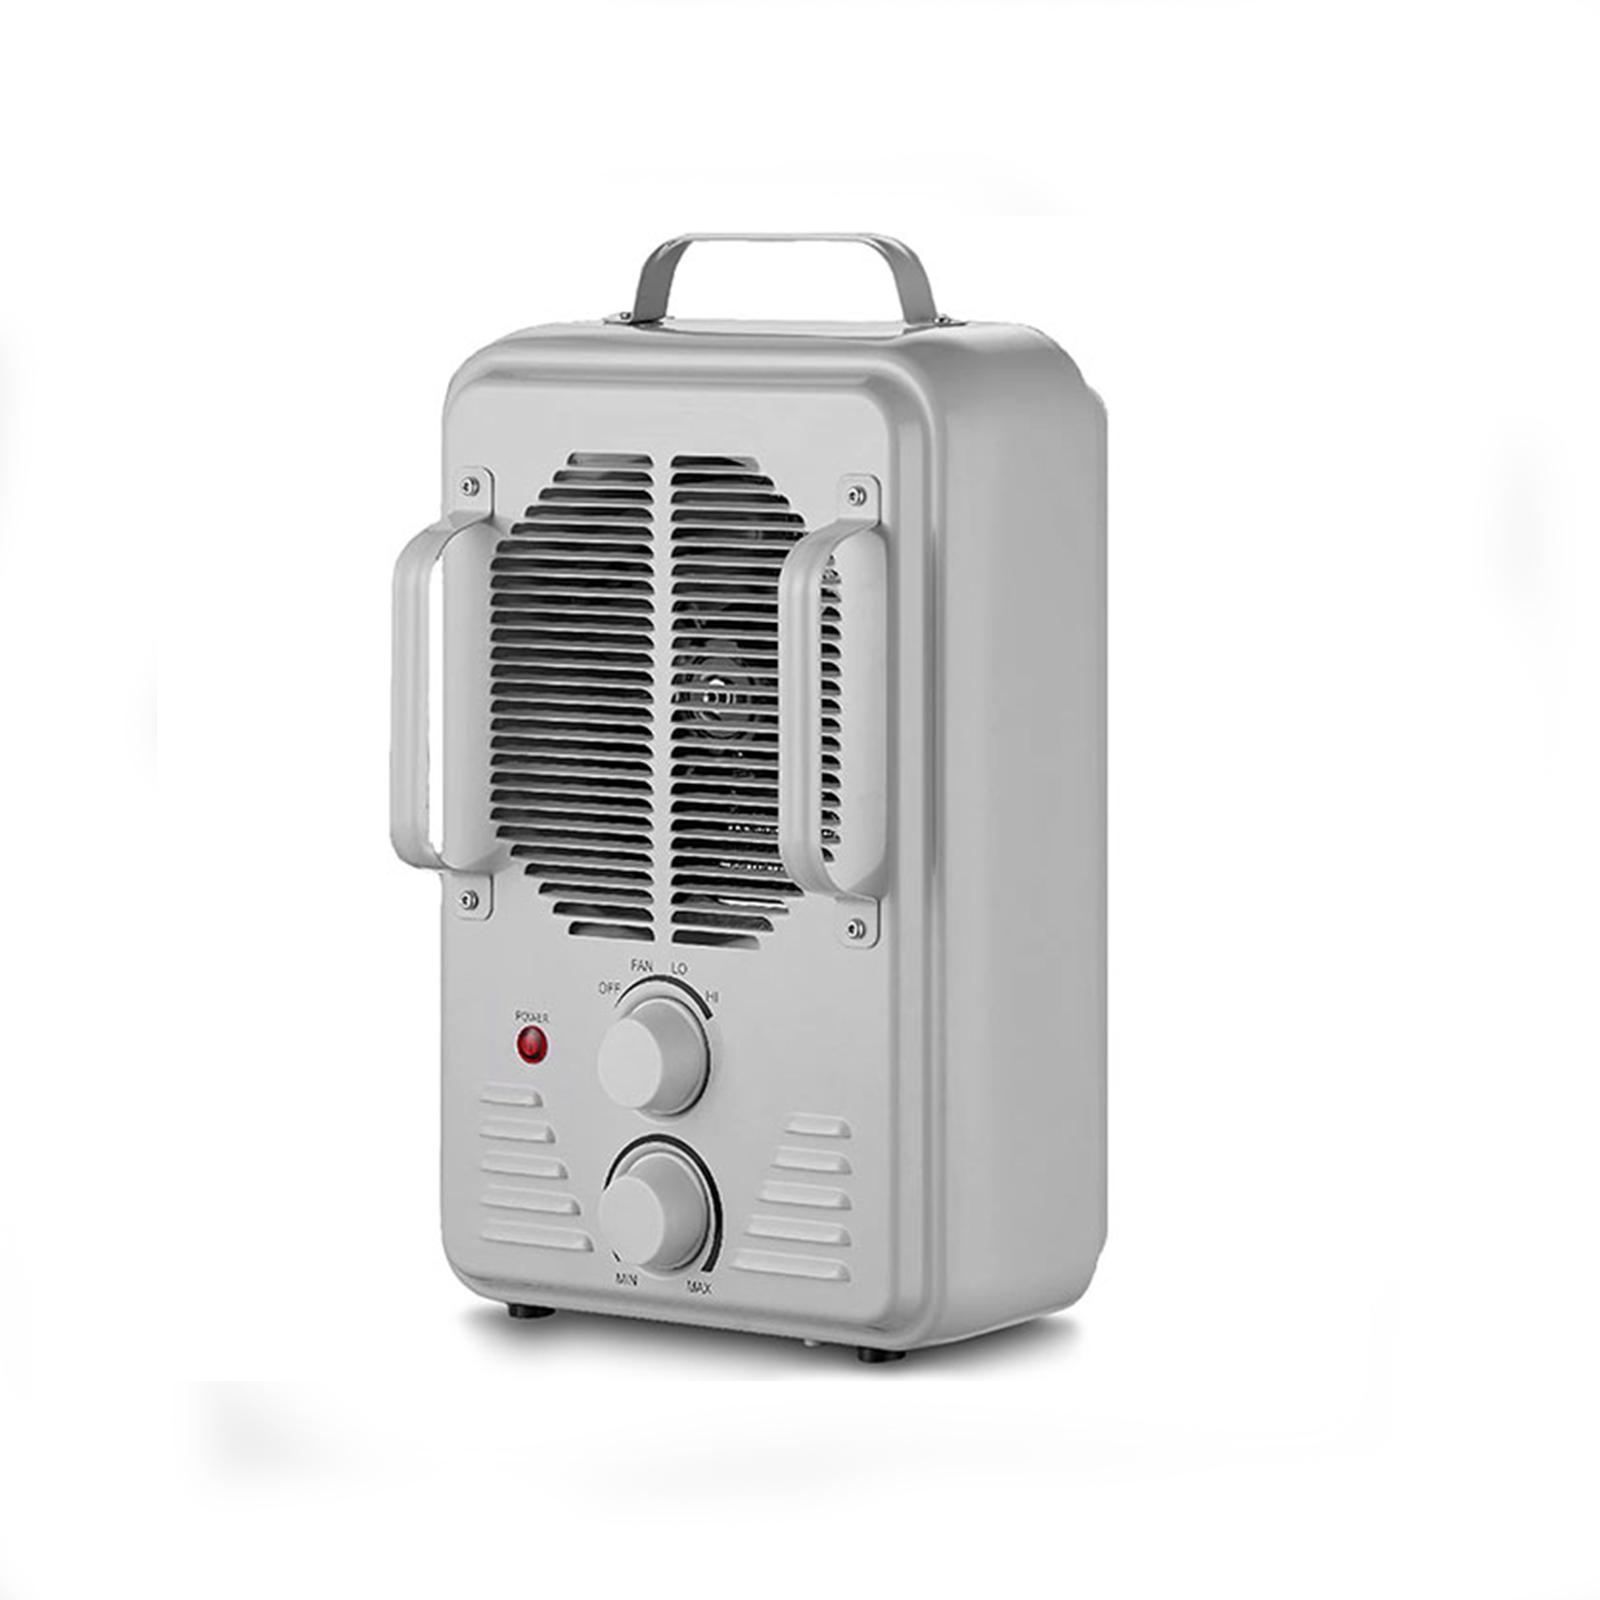 UPC 812330022269 product image for Brentwood 1500 Watt Utility Fan Heater | upcitemdb.com